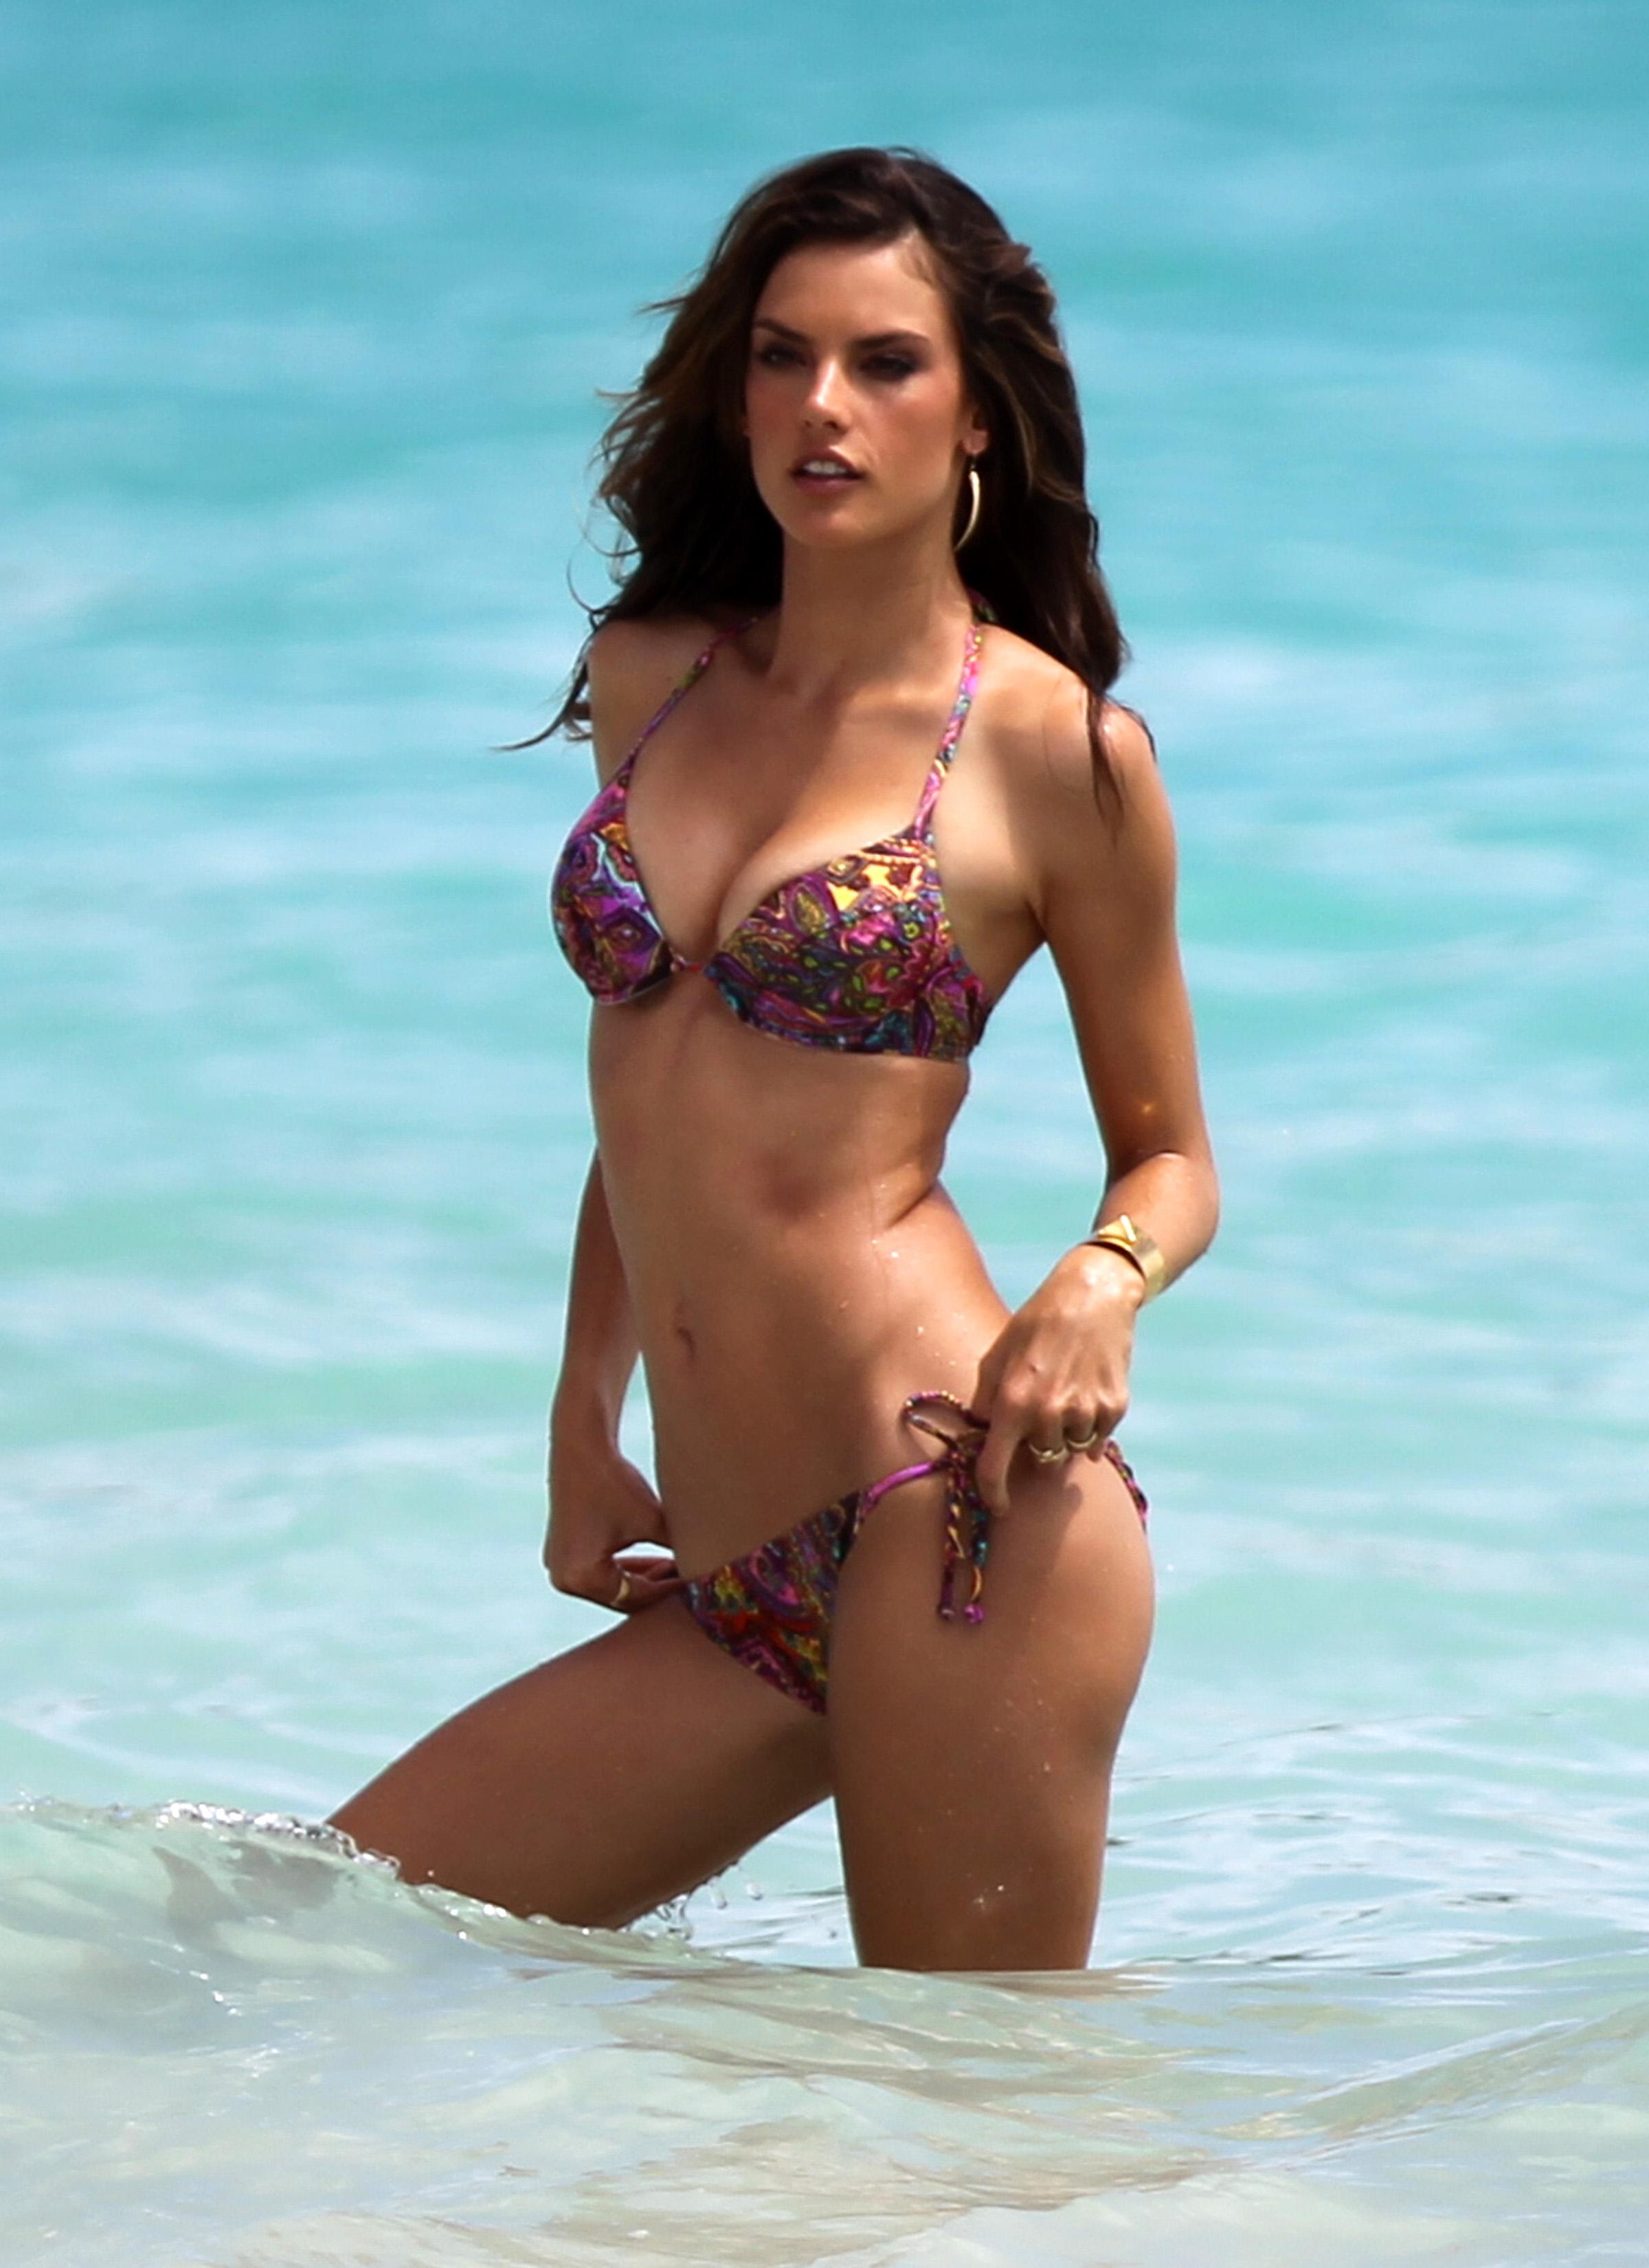 Alessandra Ambrosio Bikini Nude Photos 18